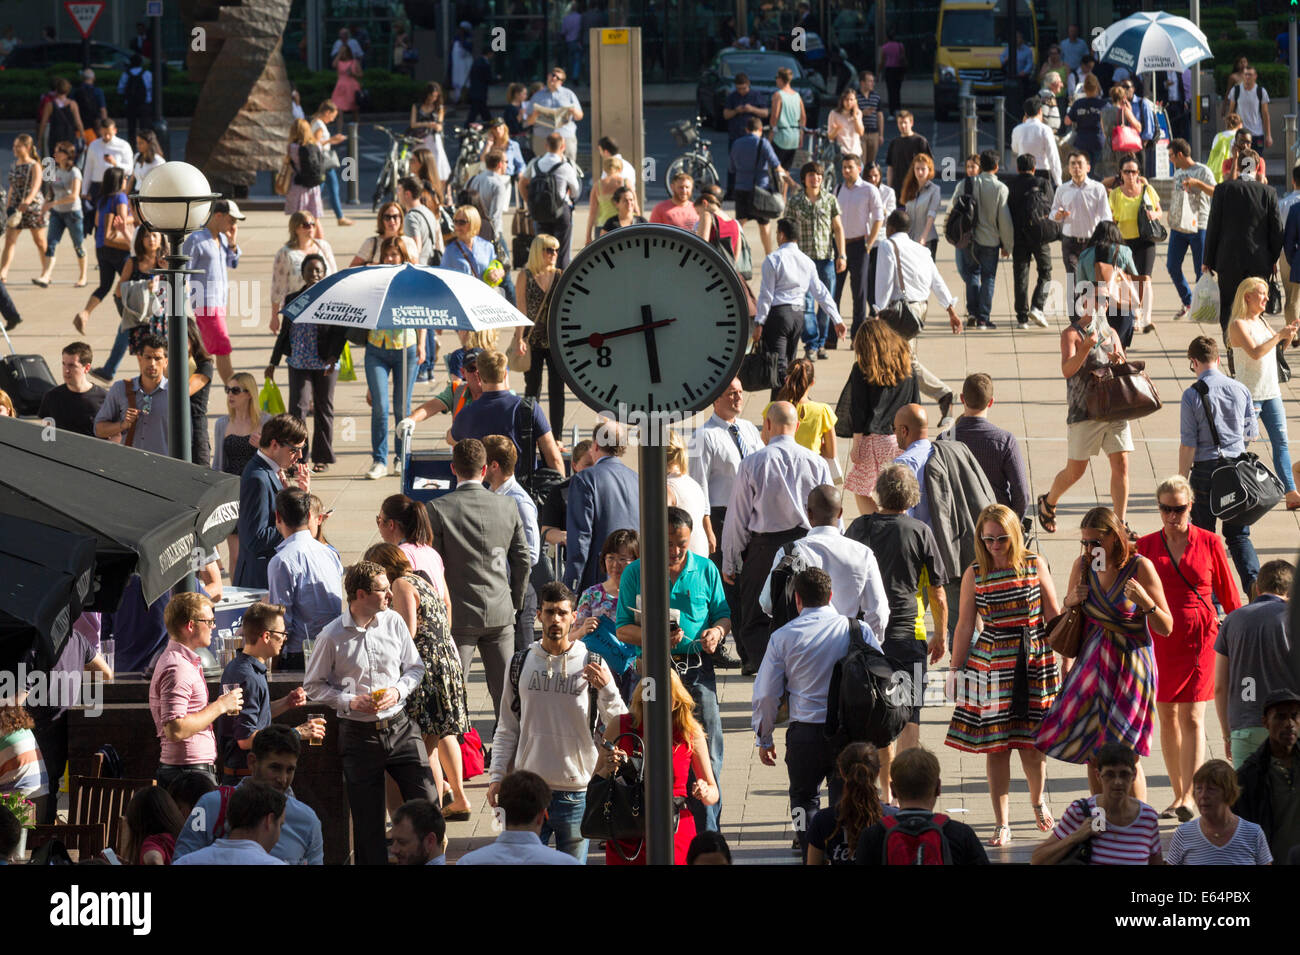 Abends Rush Hour - Canary Wharf - London Stockbild